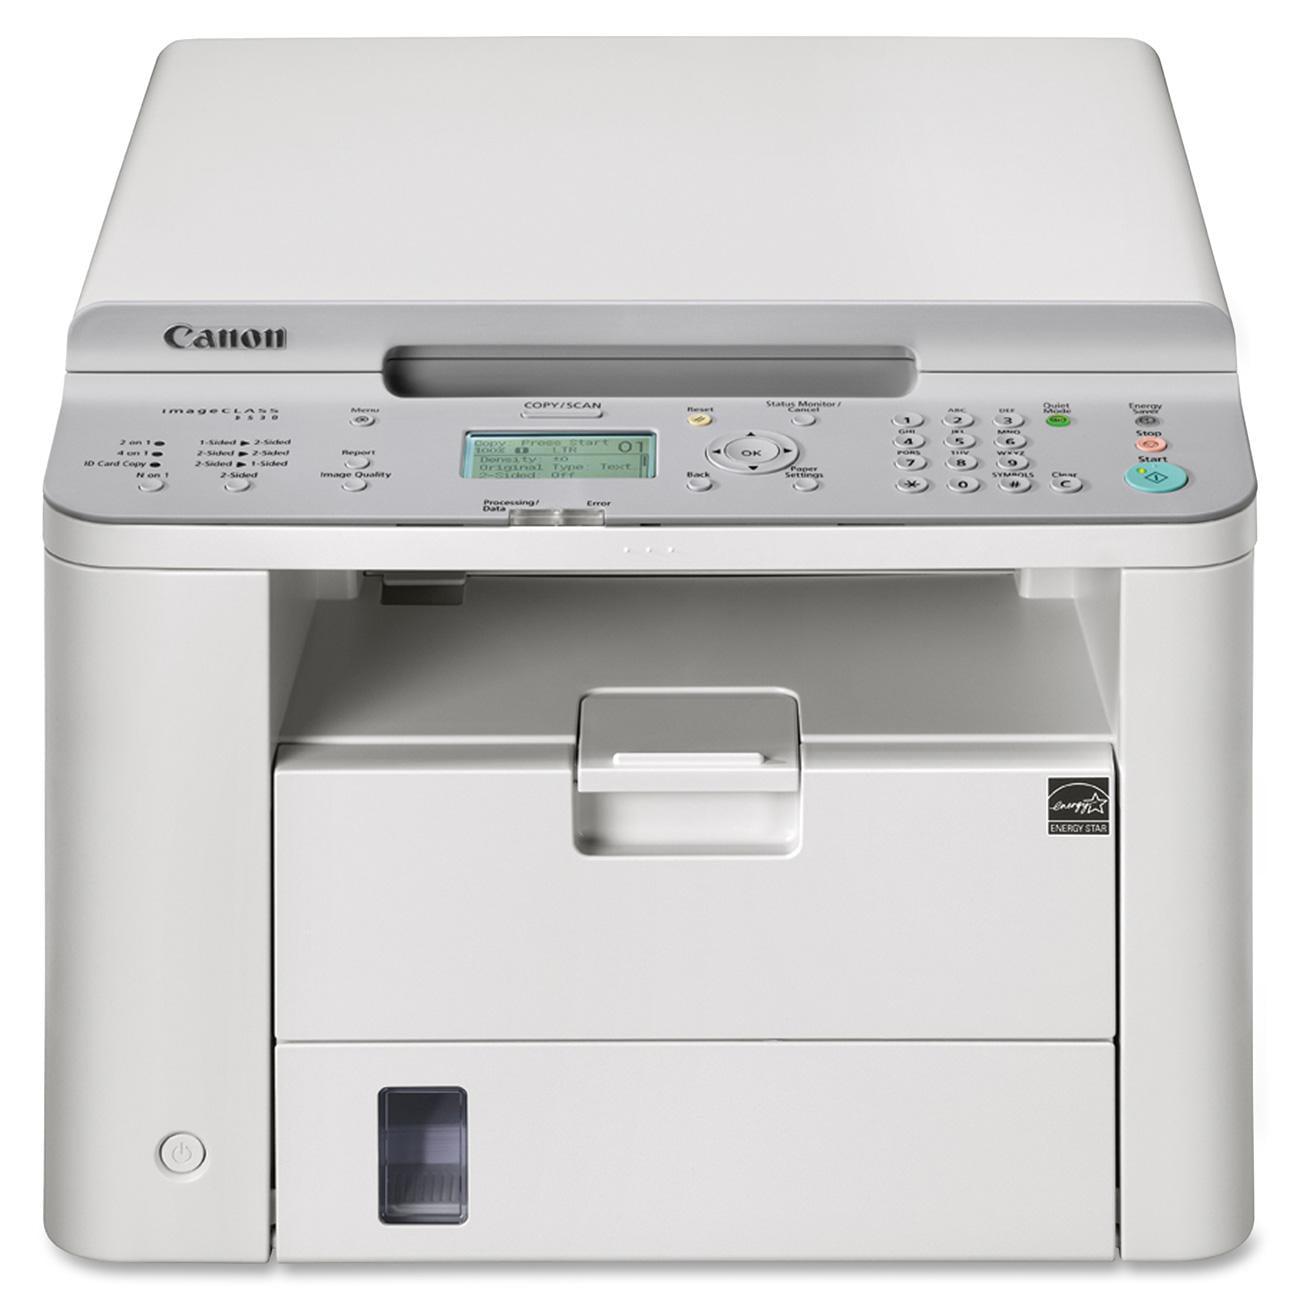 Canon imageCLASS D530 Multifunction Laser Printer, Copy/P...